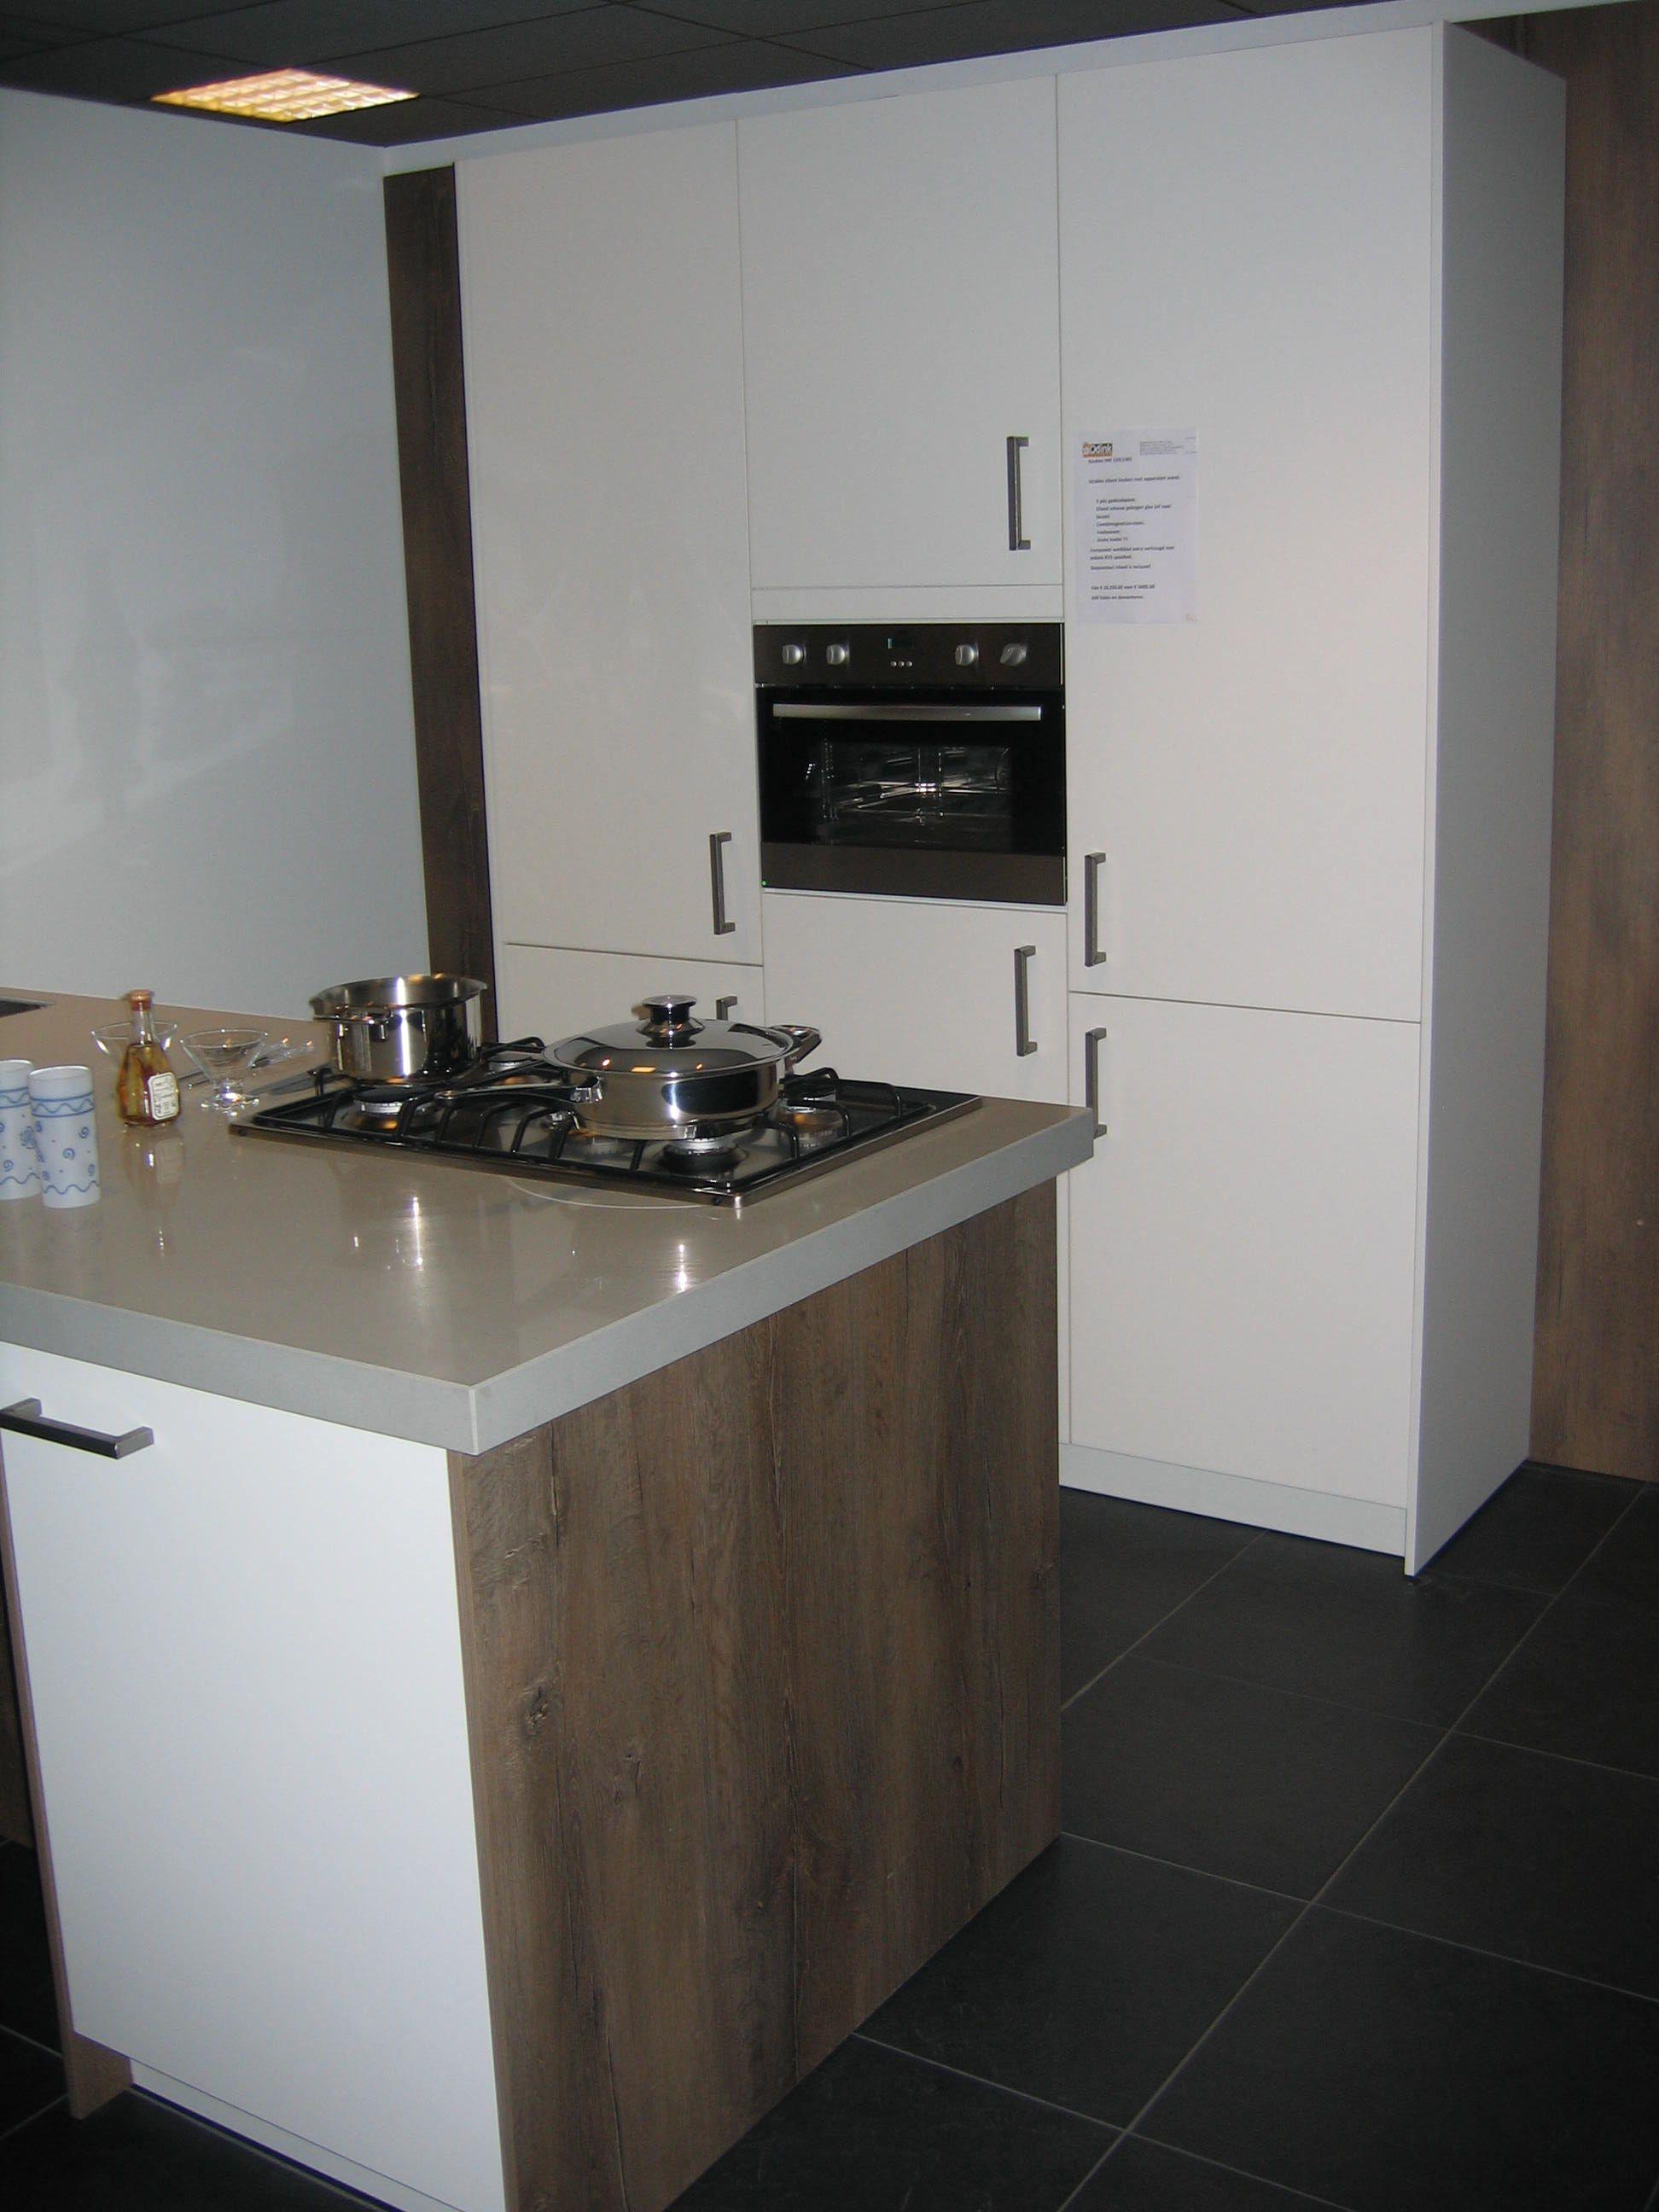 keuken carrousel le mans prijs : Ikea Keuken Hoekkast Nl Funvit Com Badkamermeubelen Ikea Keuken